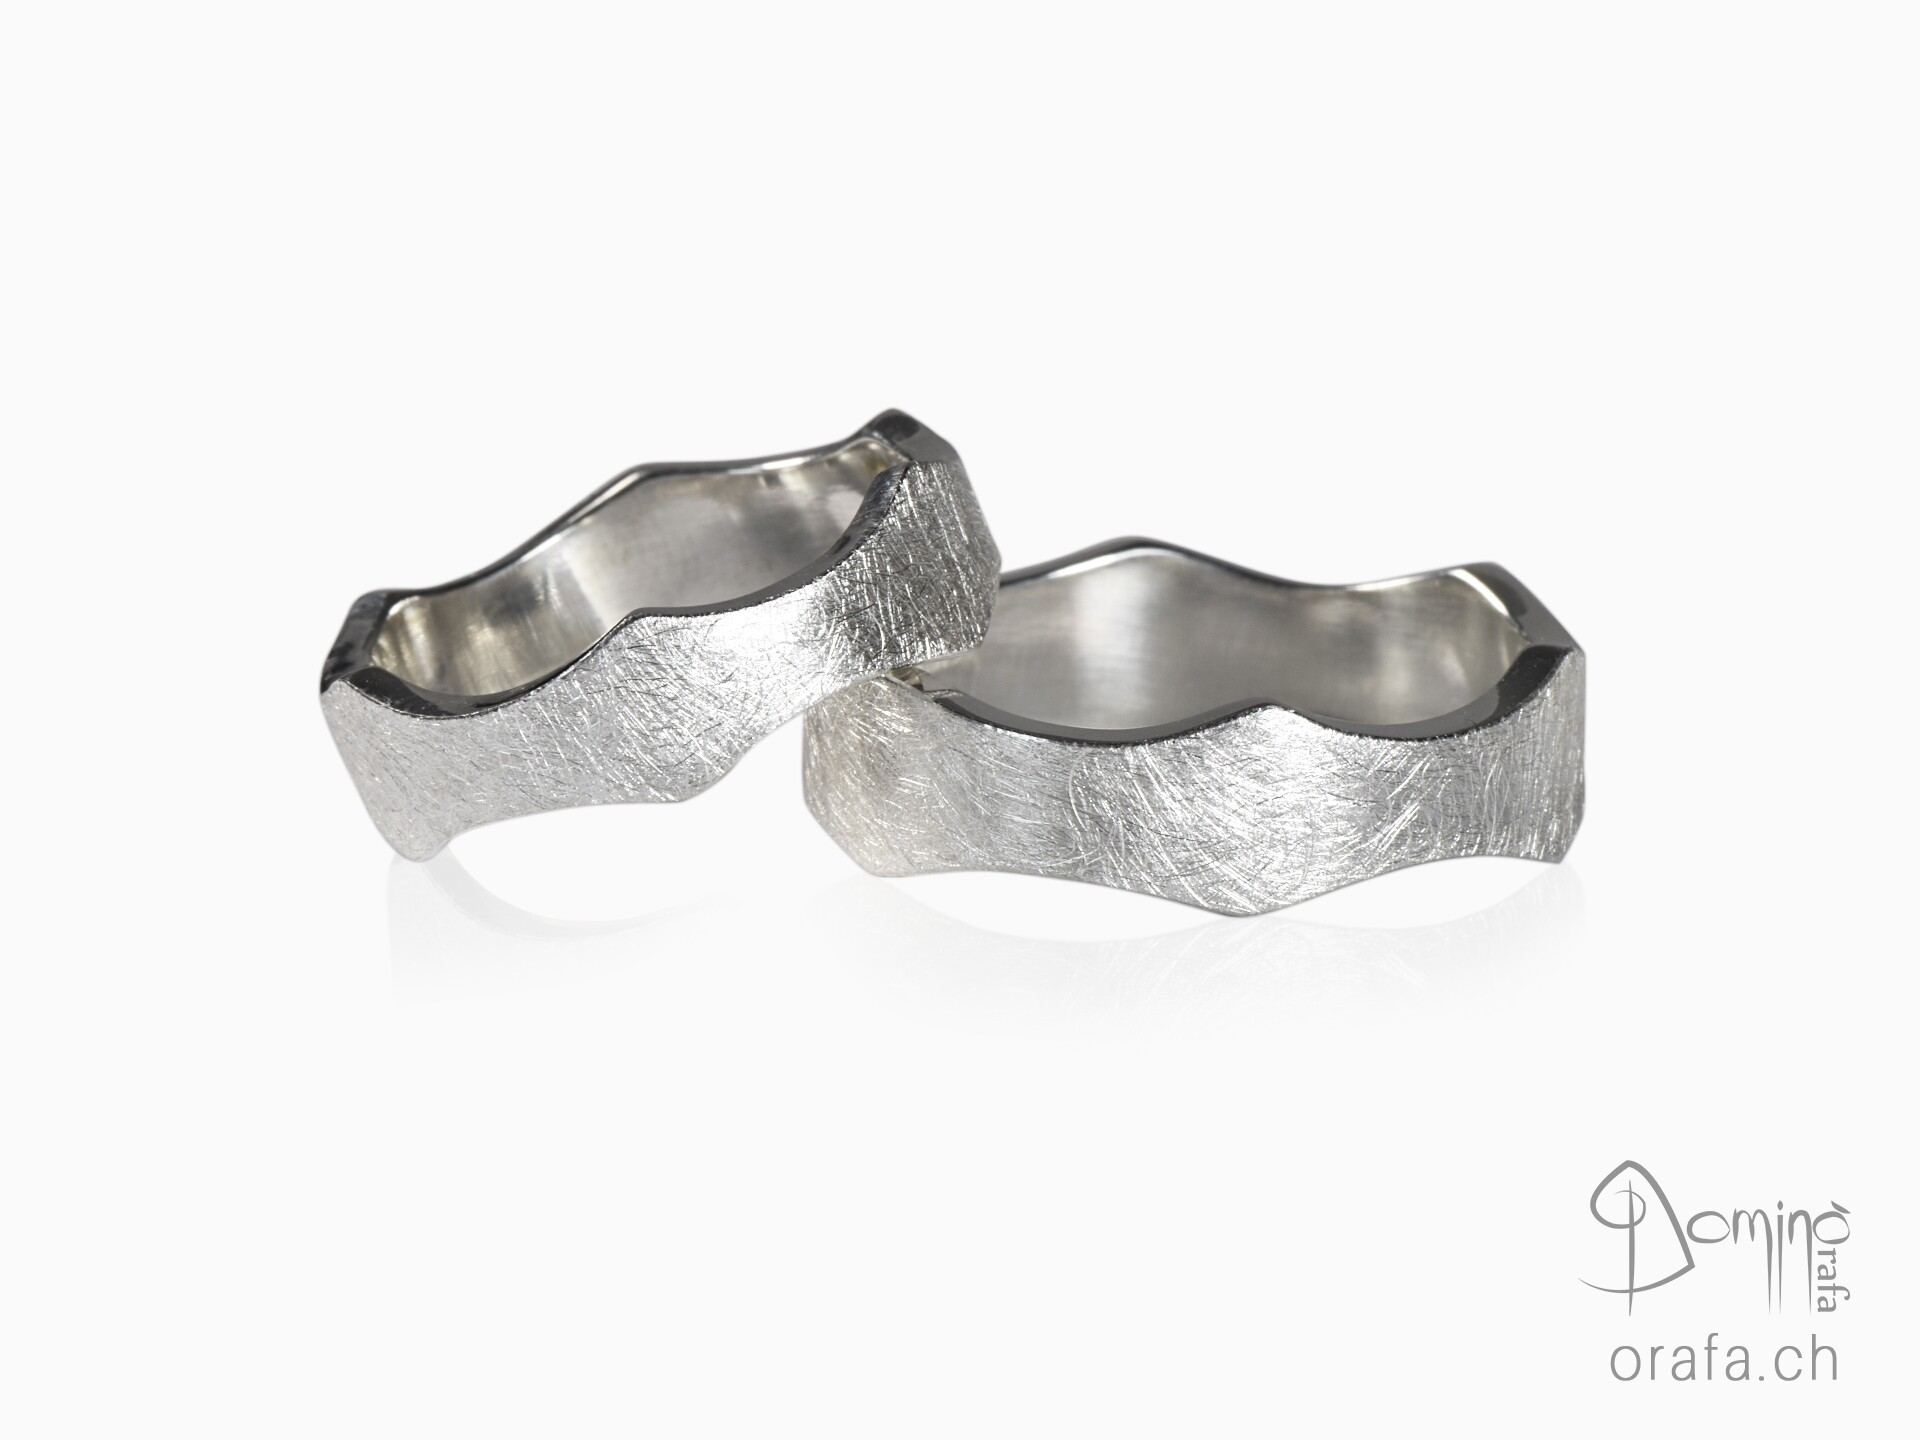 anelli-bordi-a-v-1